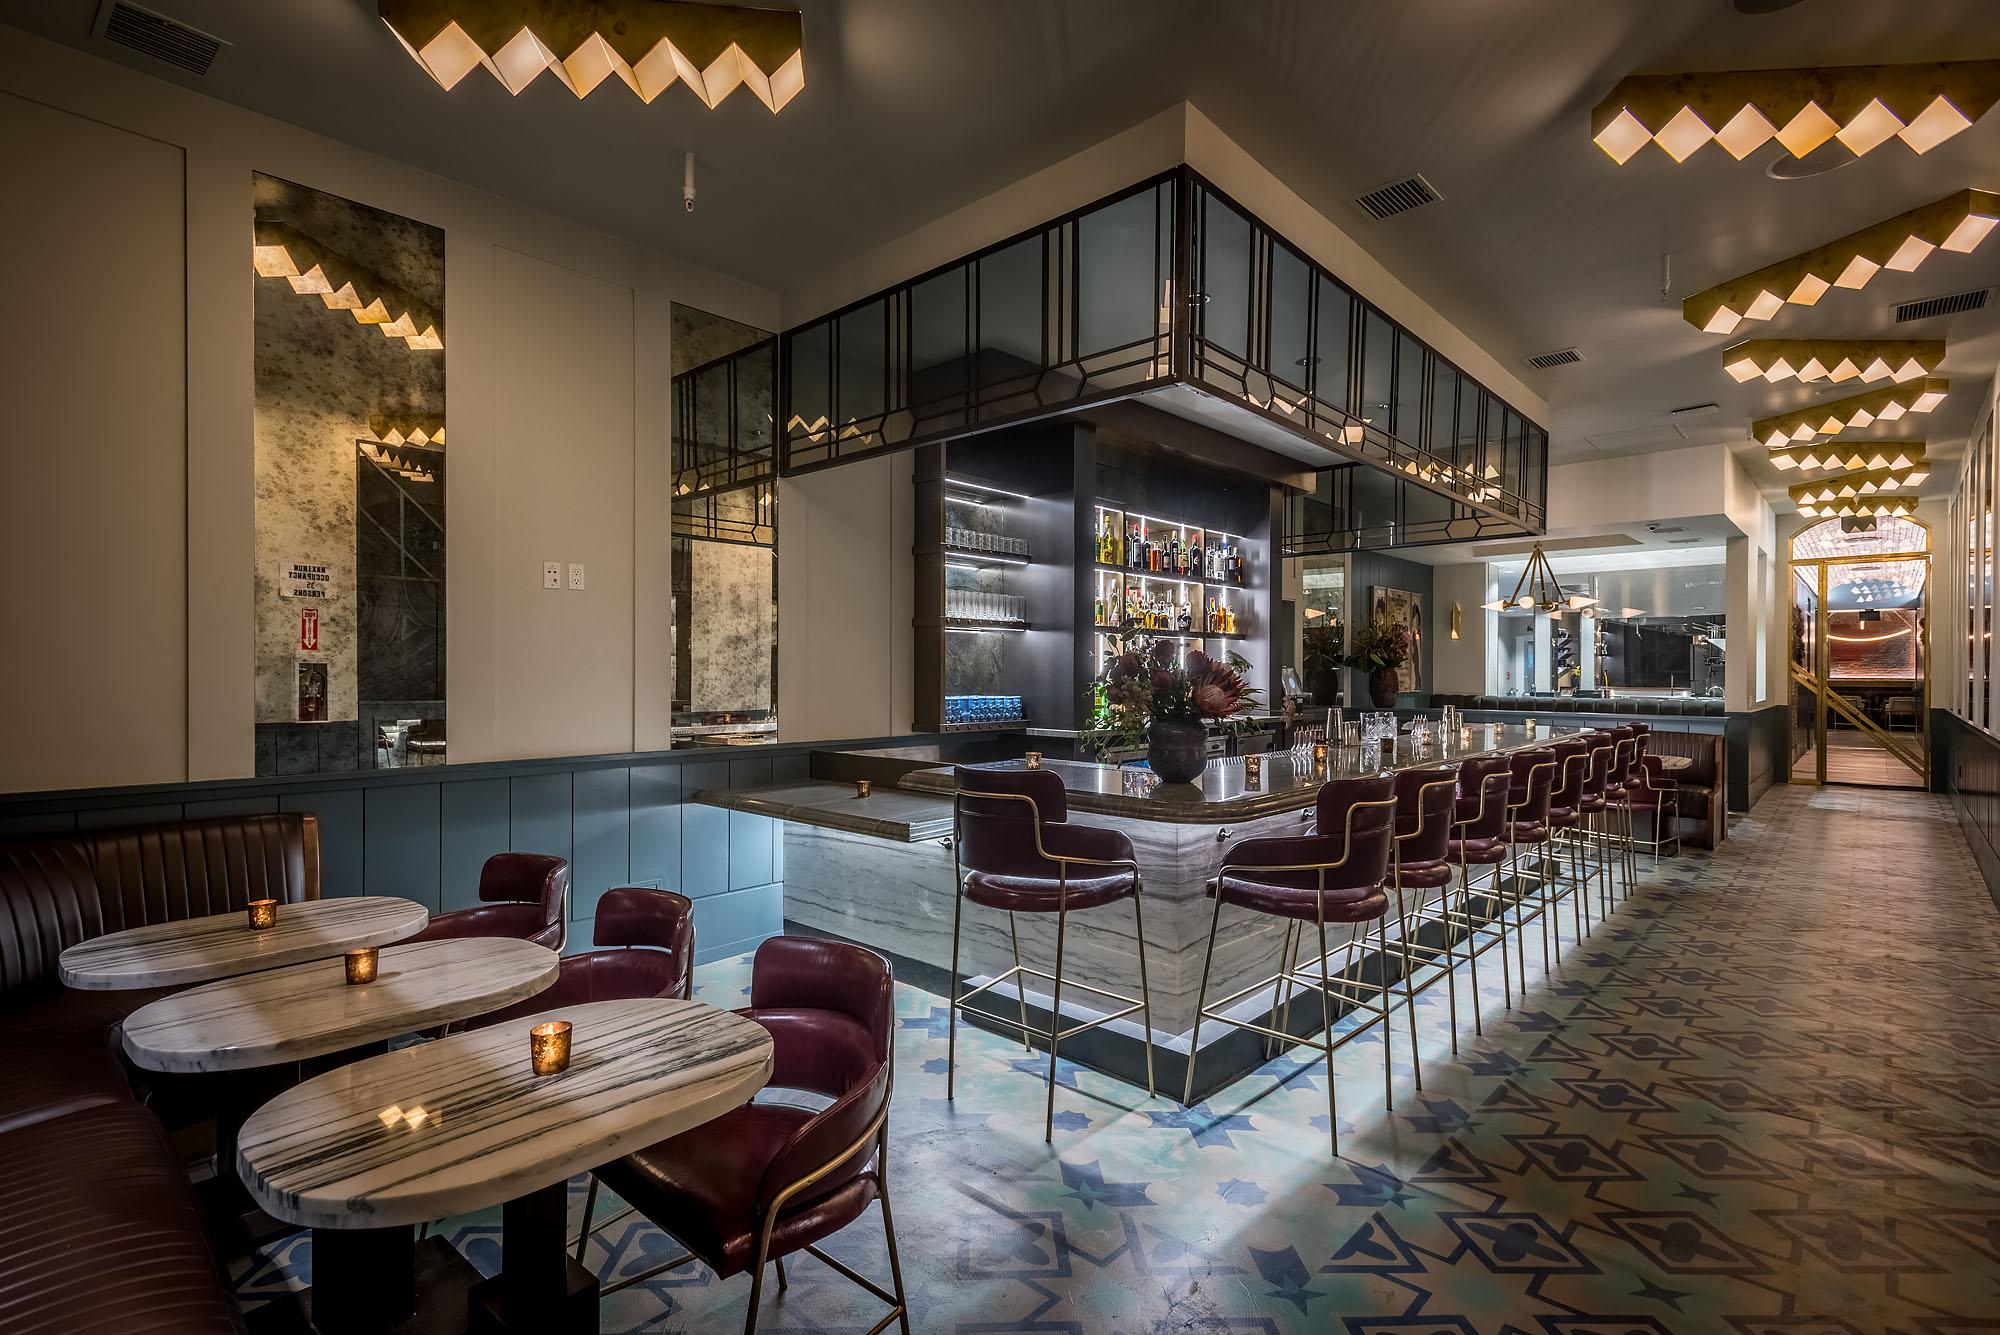 LA Restaurant Closings - Eater LA